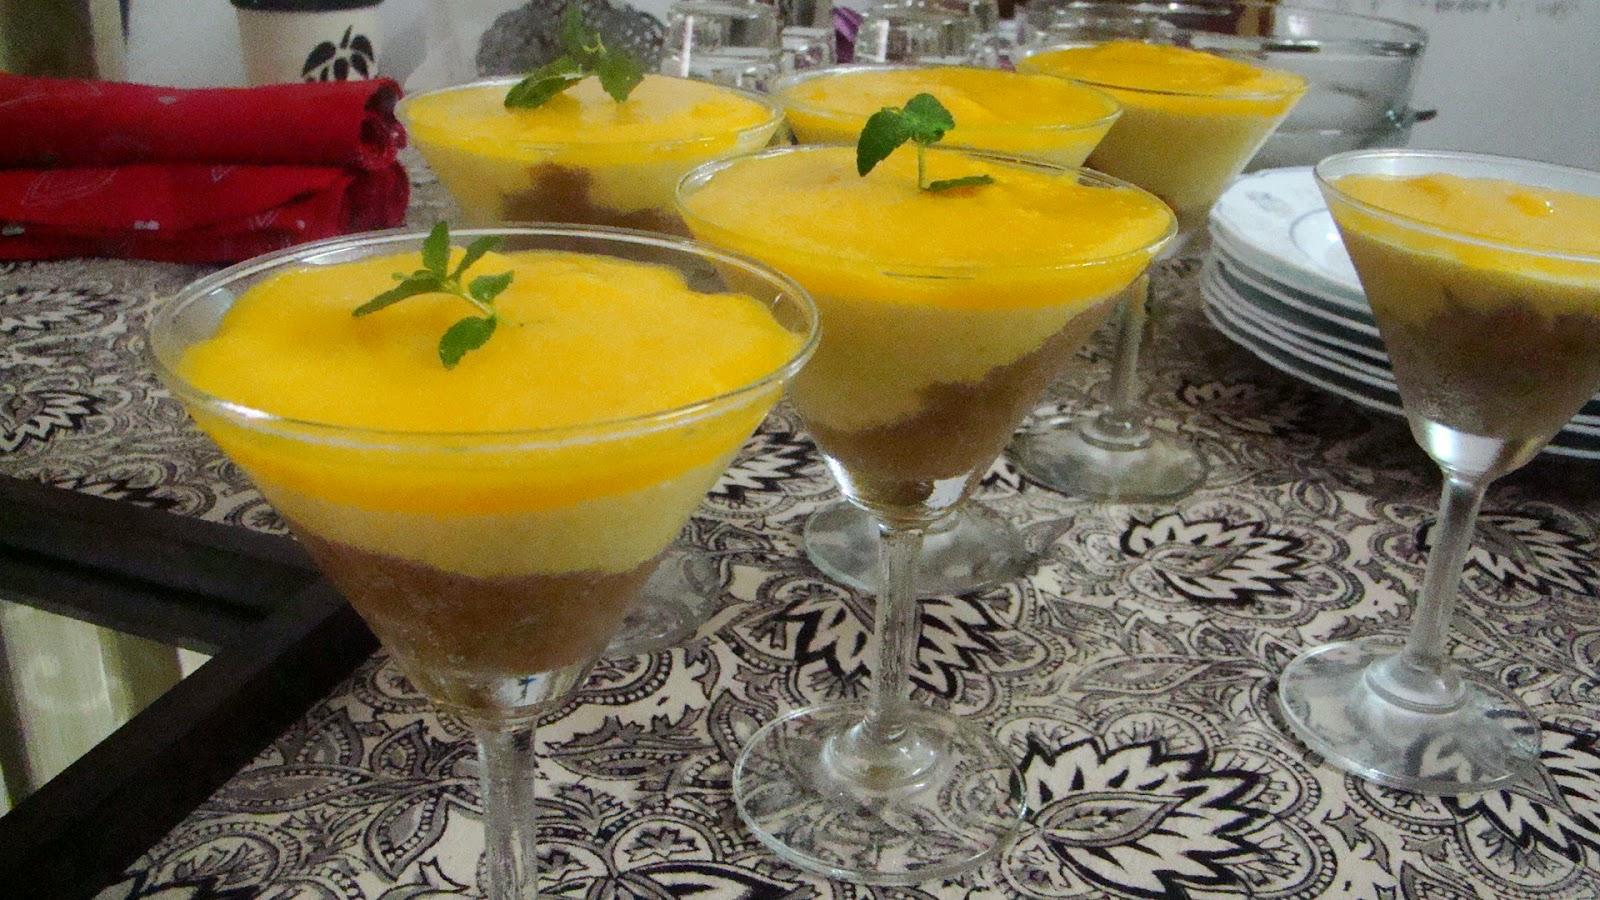 Jiggs kalra recipes